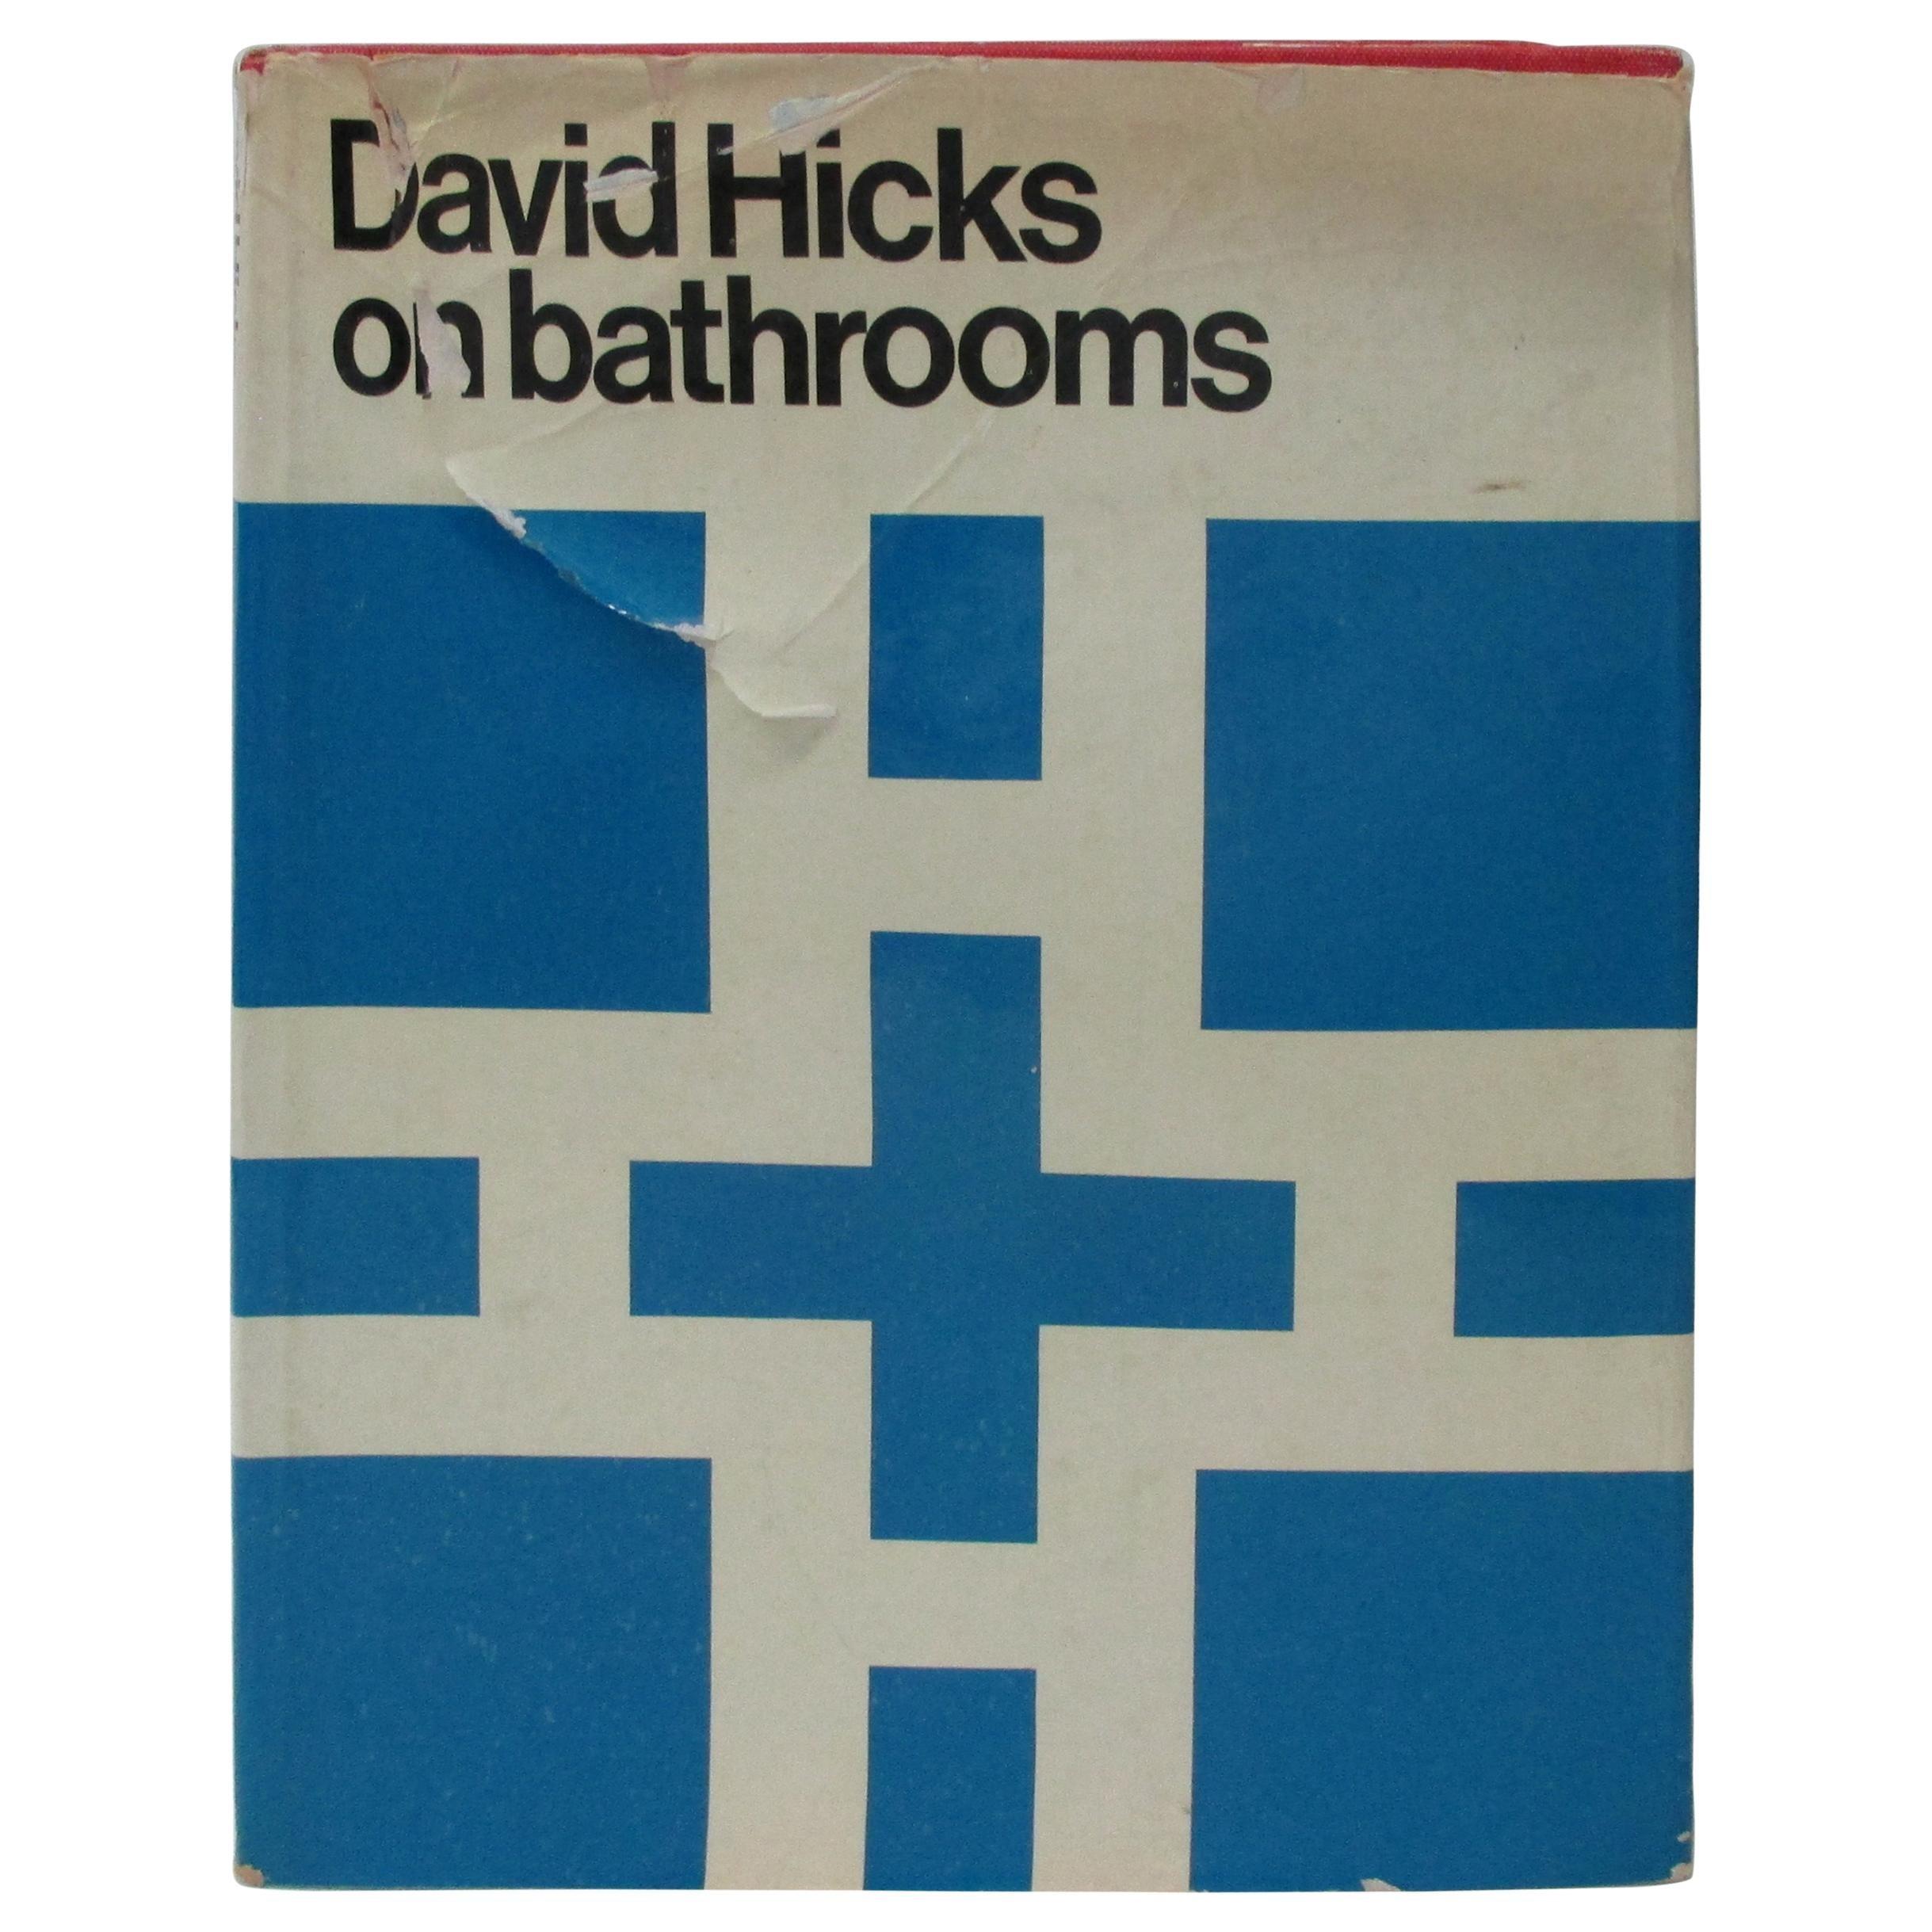 David Hicks on Bathrooms Hardcover Book